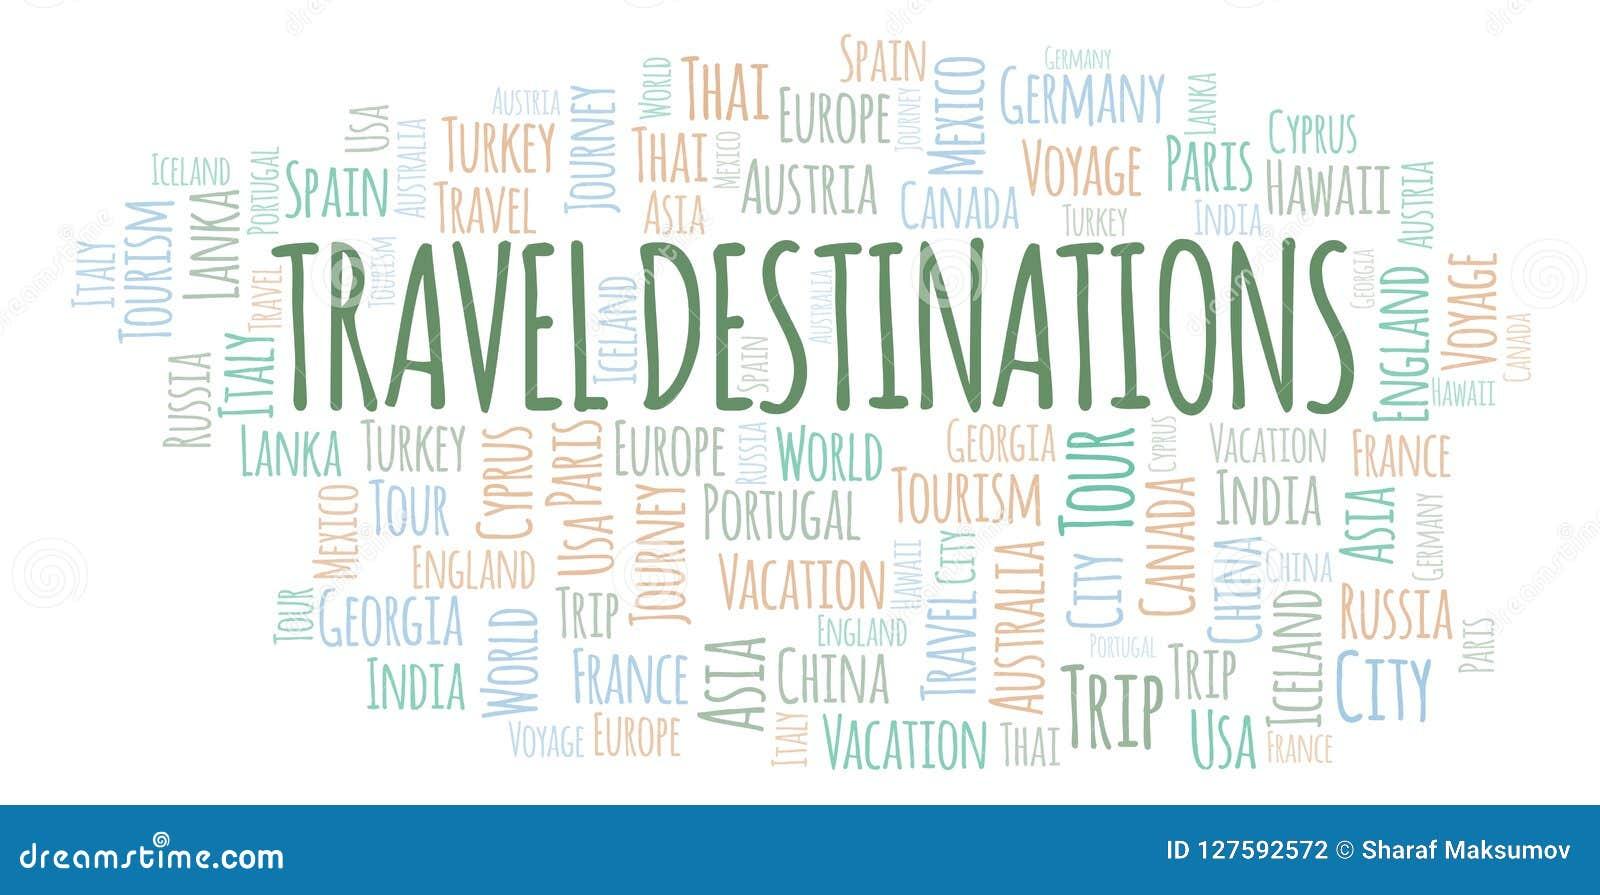 Travel Destinations word cloud.